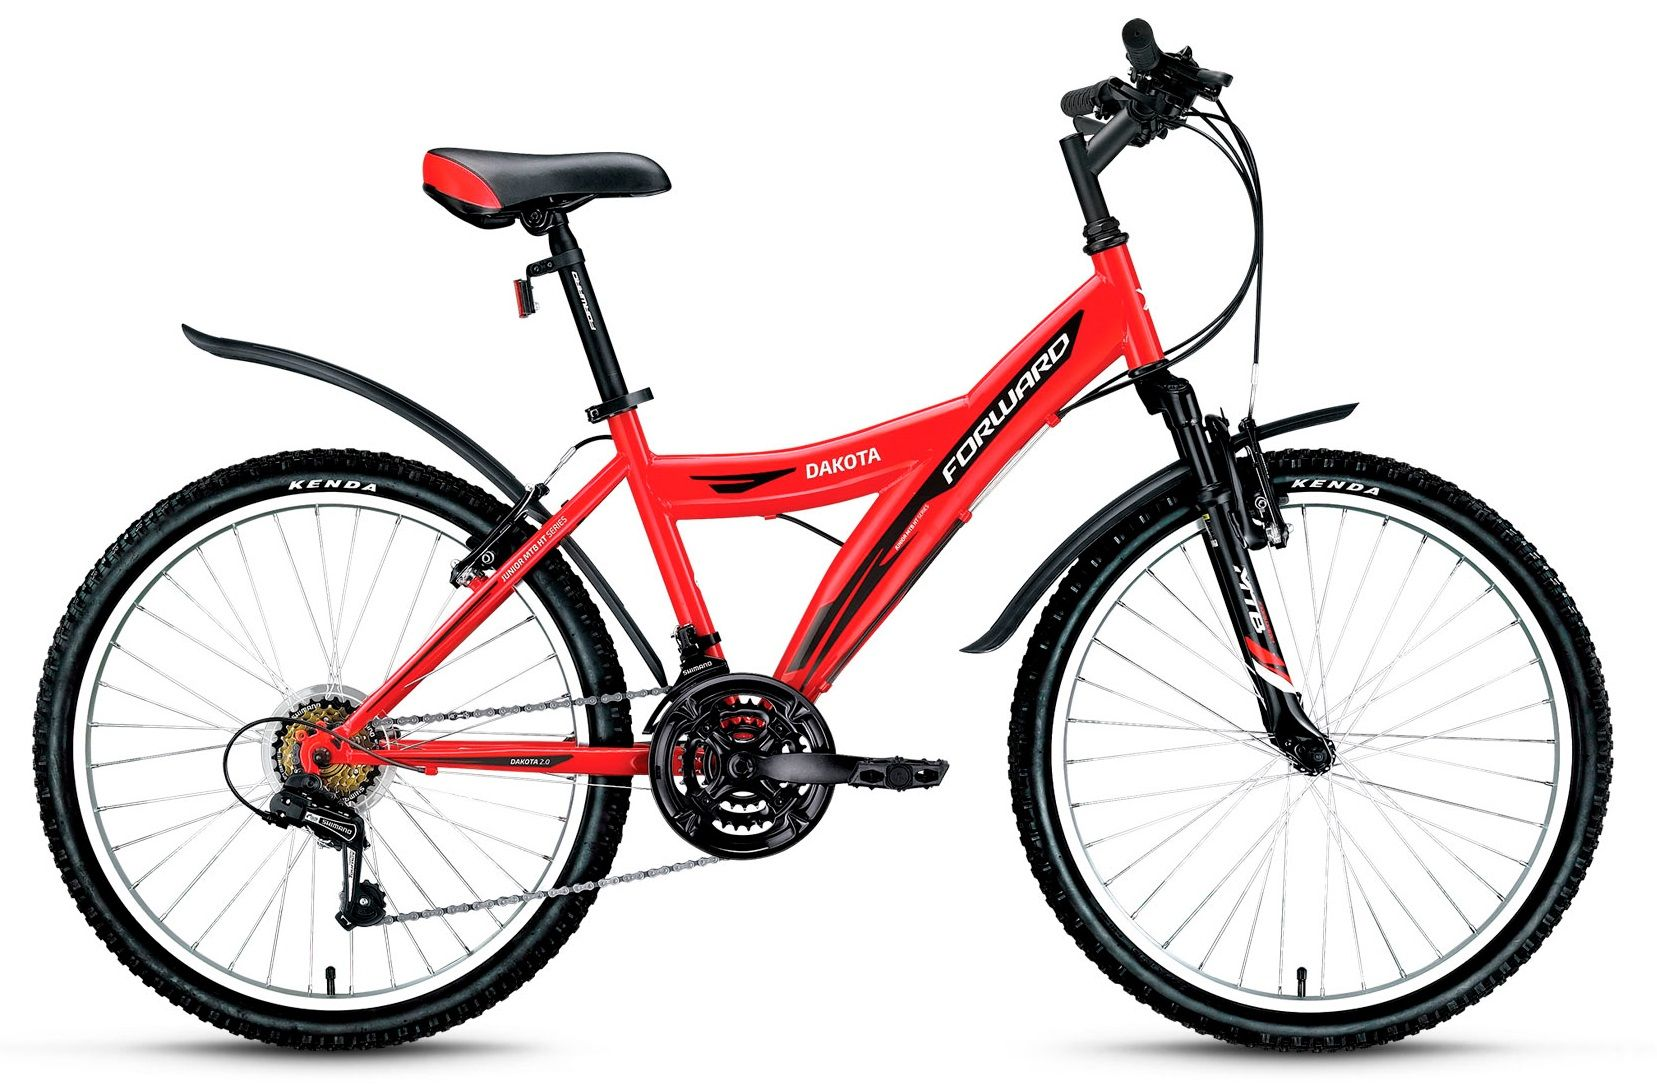 Велосипед Forward Dakota 24 2.0 2016 велосипед forward valencia 1 0 24 2016